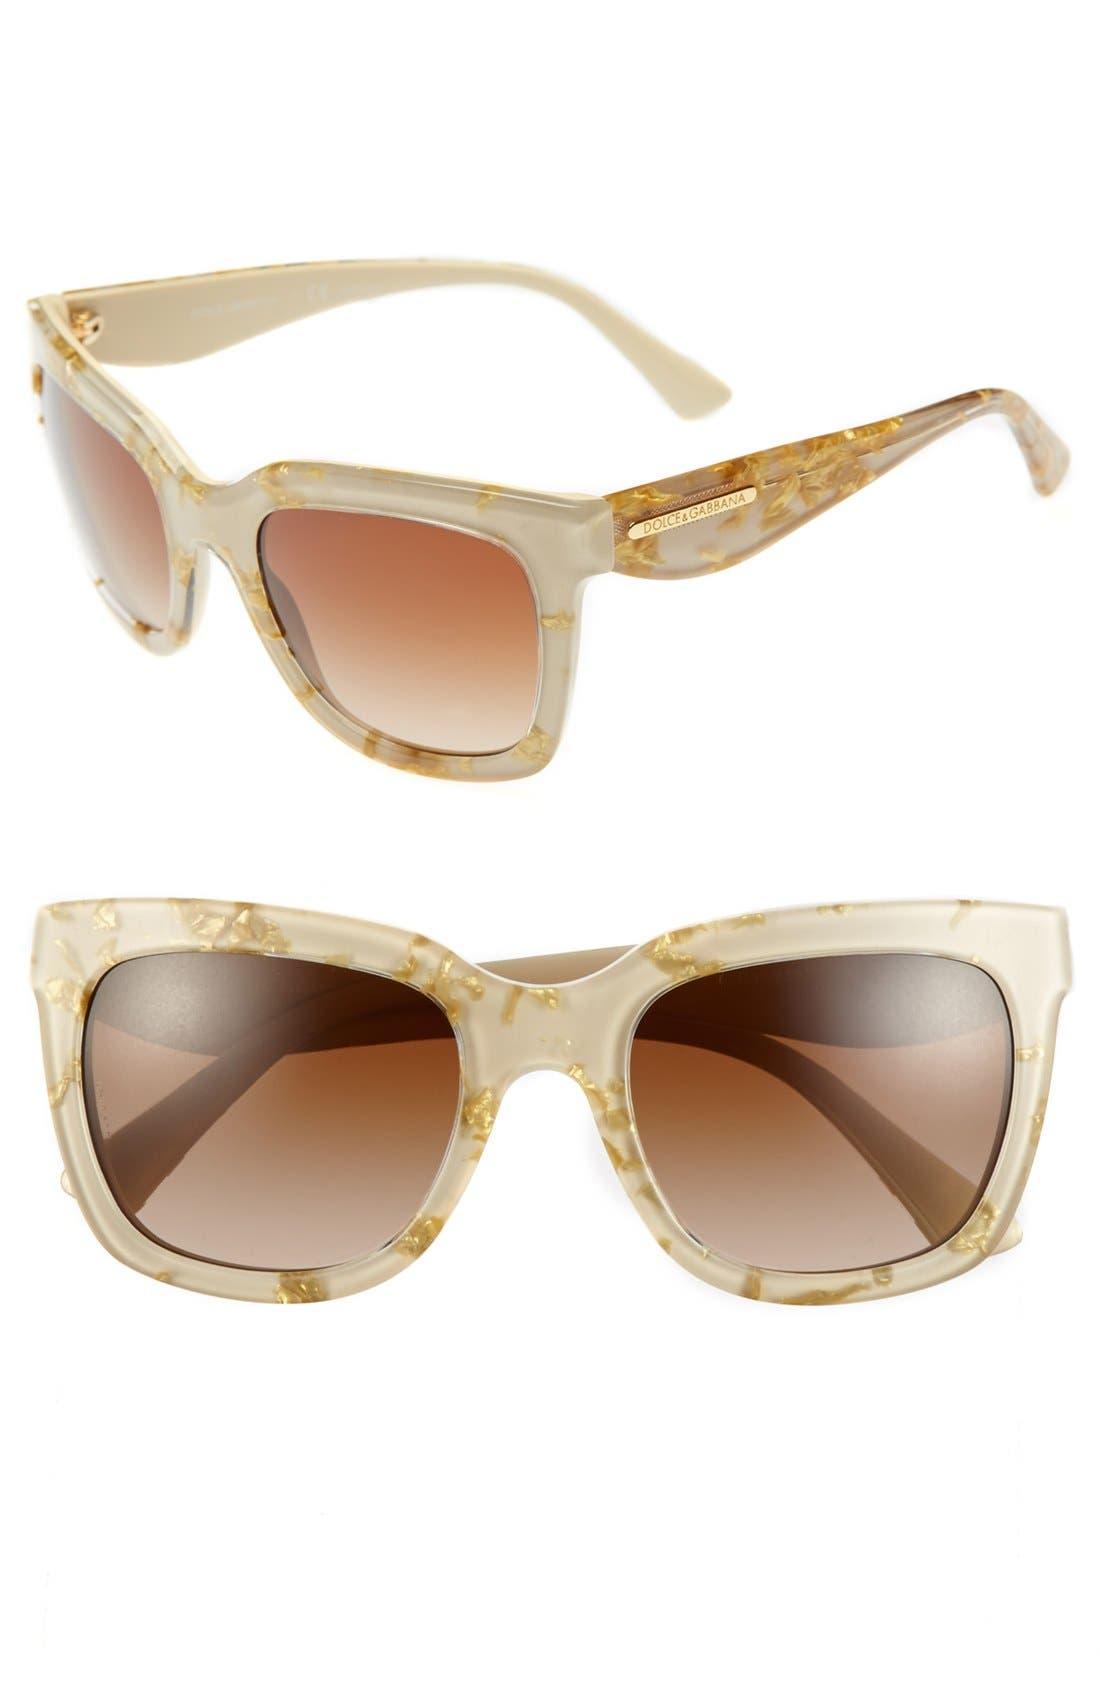 Alternate Image 1 Selected - Dolce&Gabbana 'Gold Leaf' 53mm Sunglasses